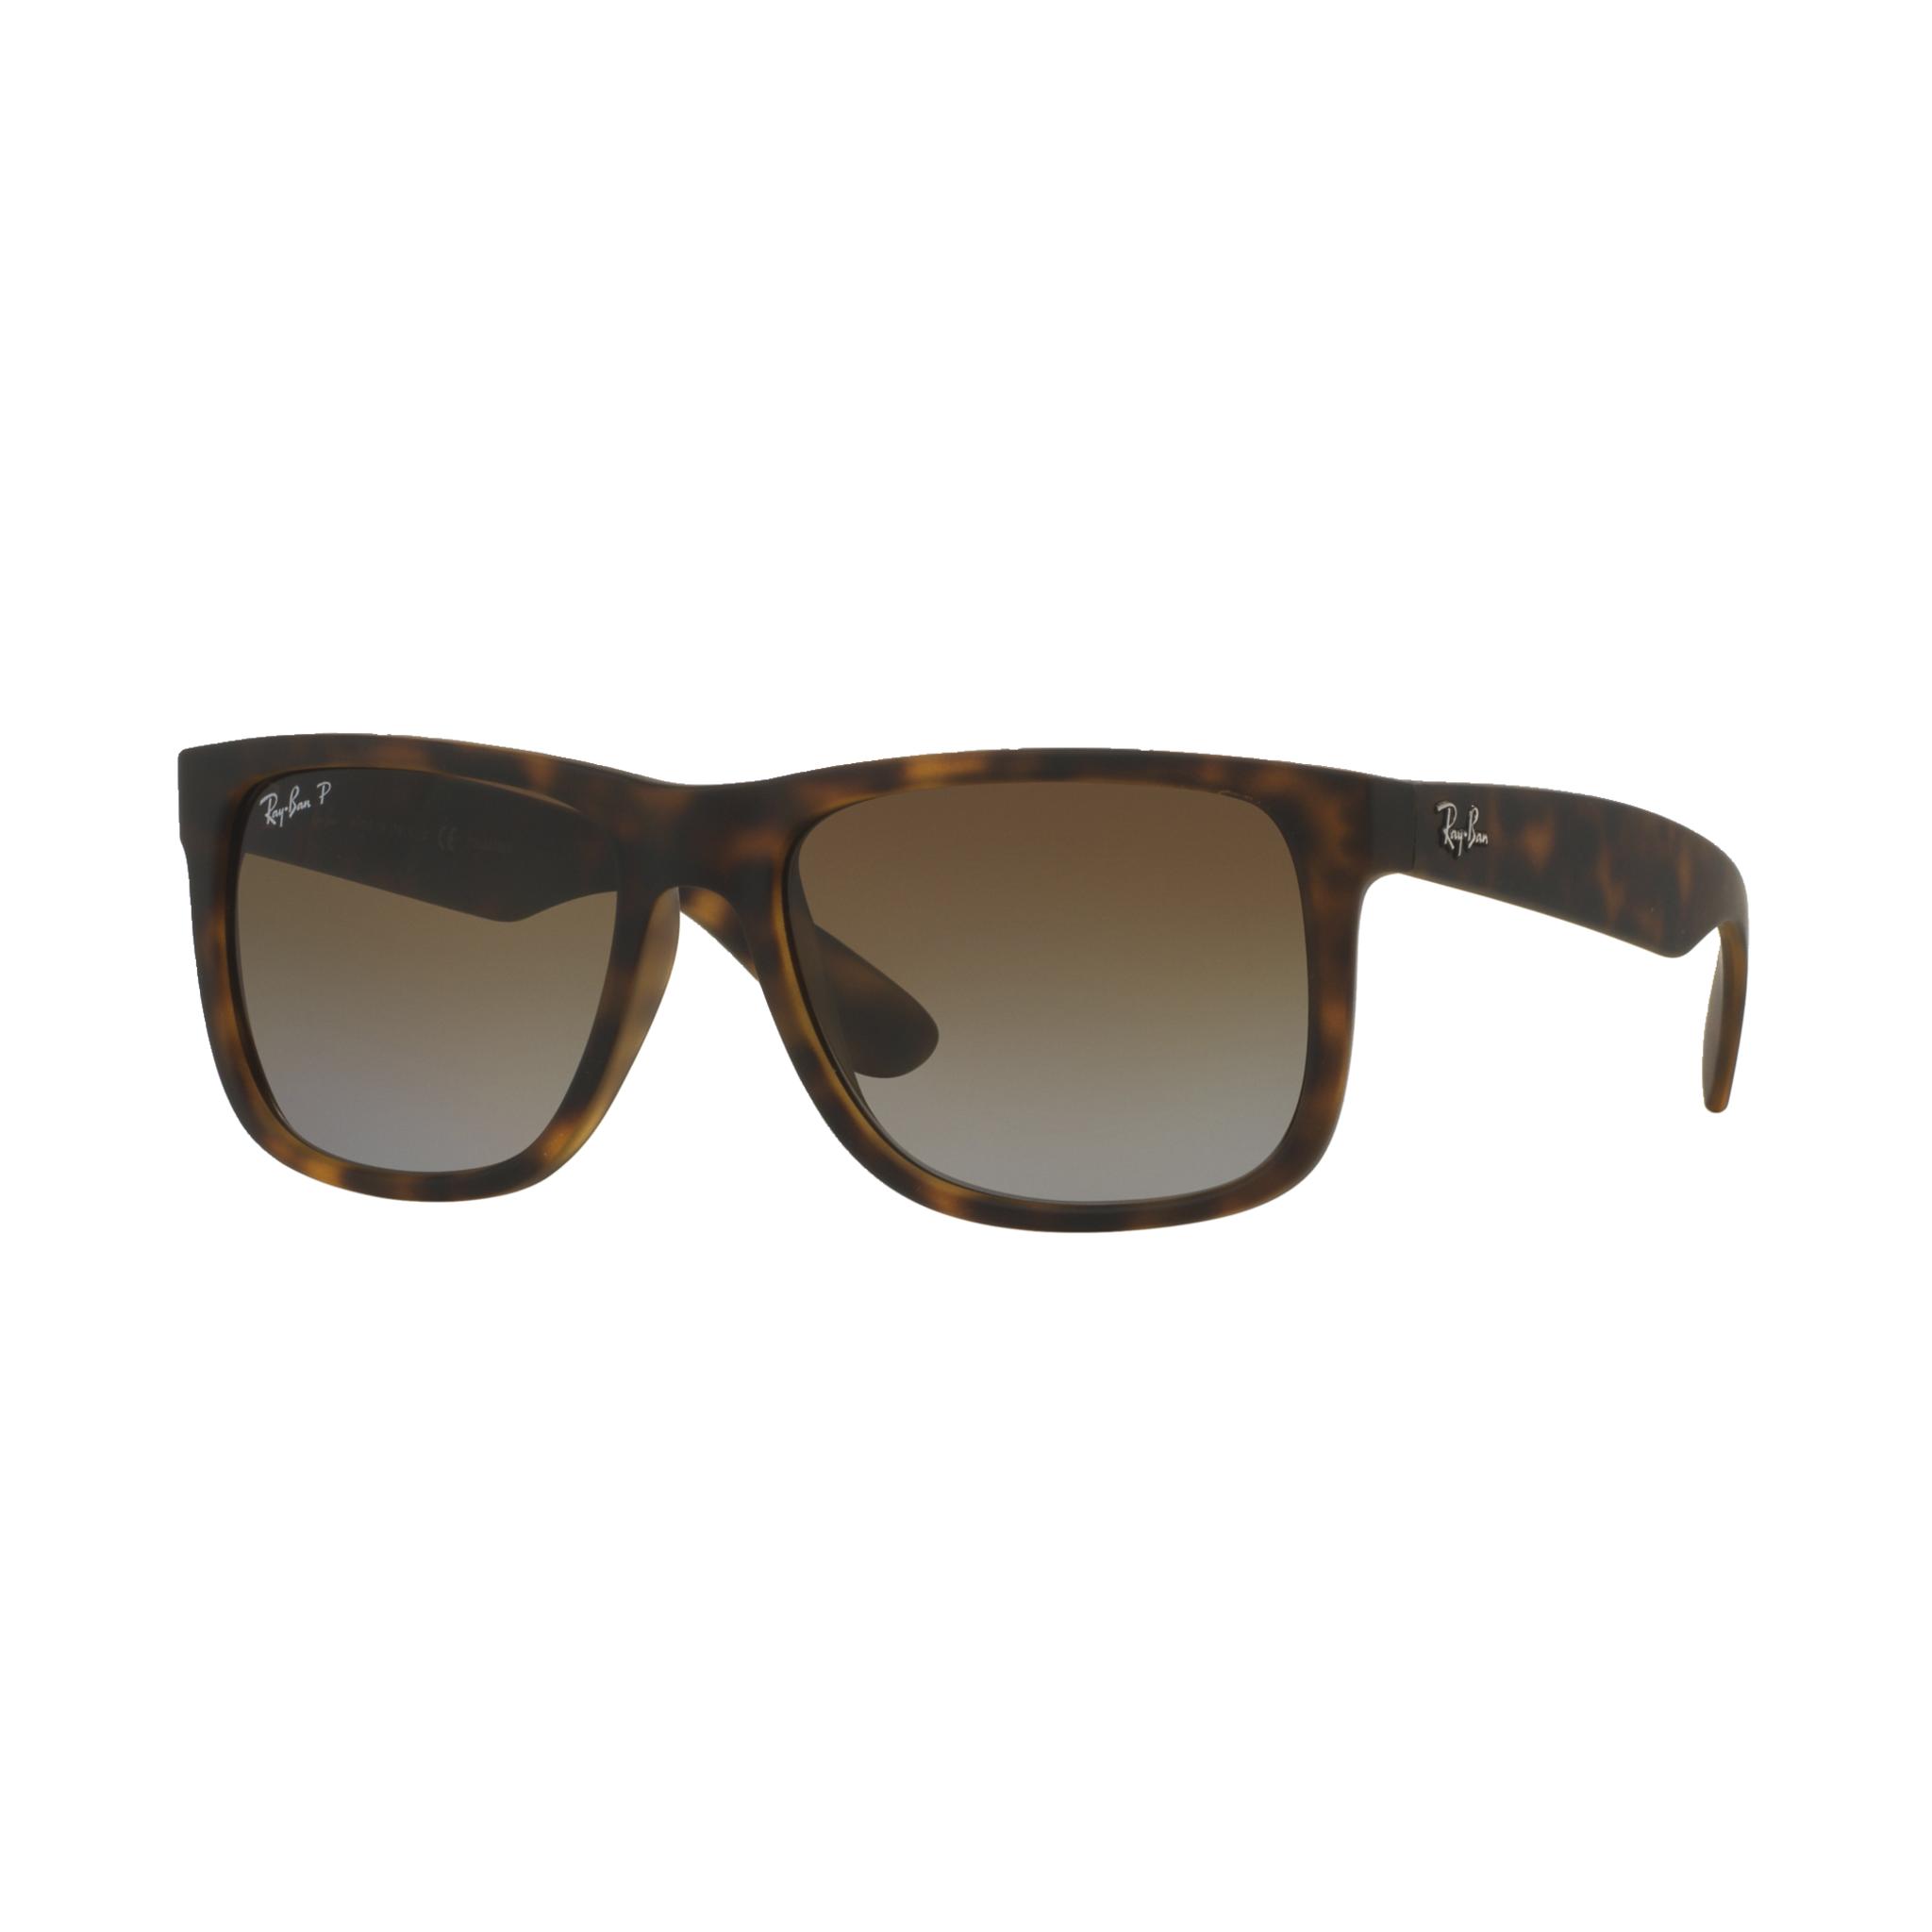 Ray-Ban Justin 865/T5 55, solbriller 55 HAVANA RUBBER